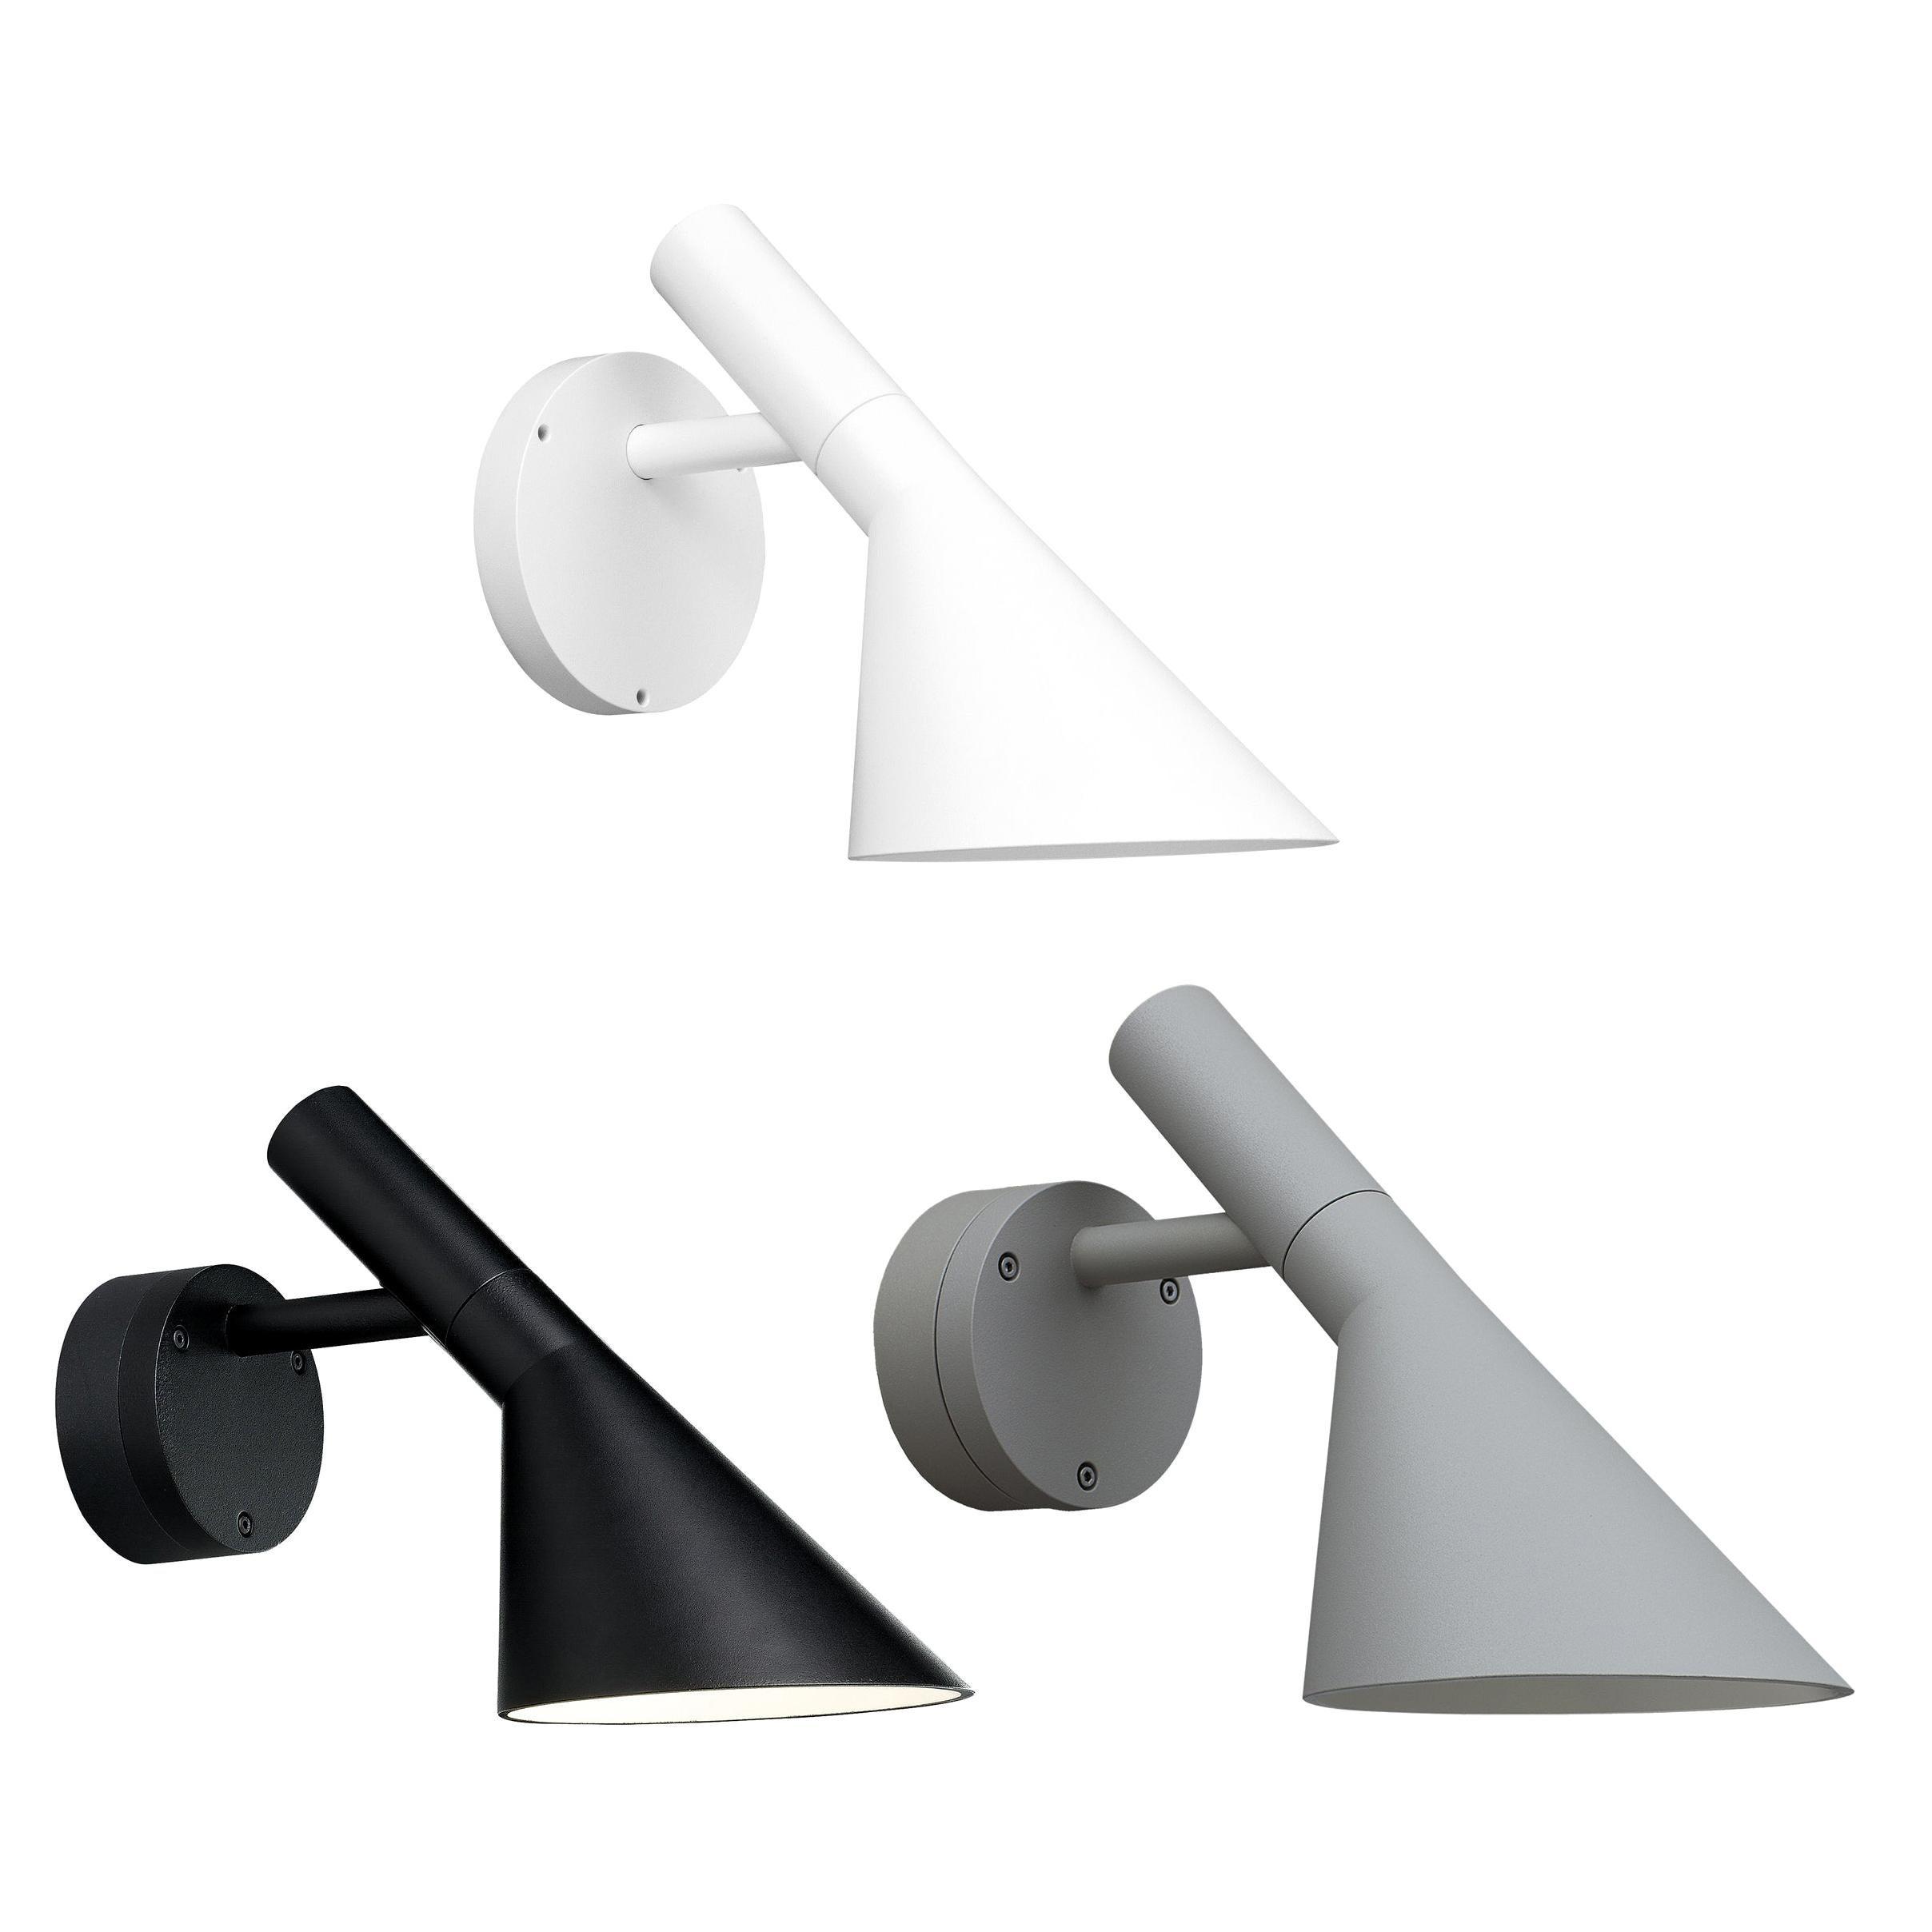 Arne Jacobsen AJ 50 Outdoor Wall Light for Louis Poulsen